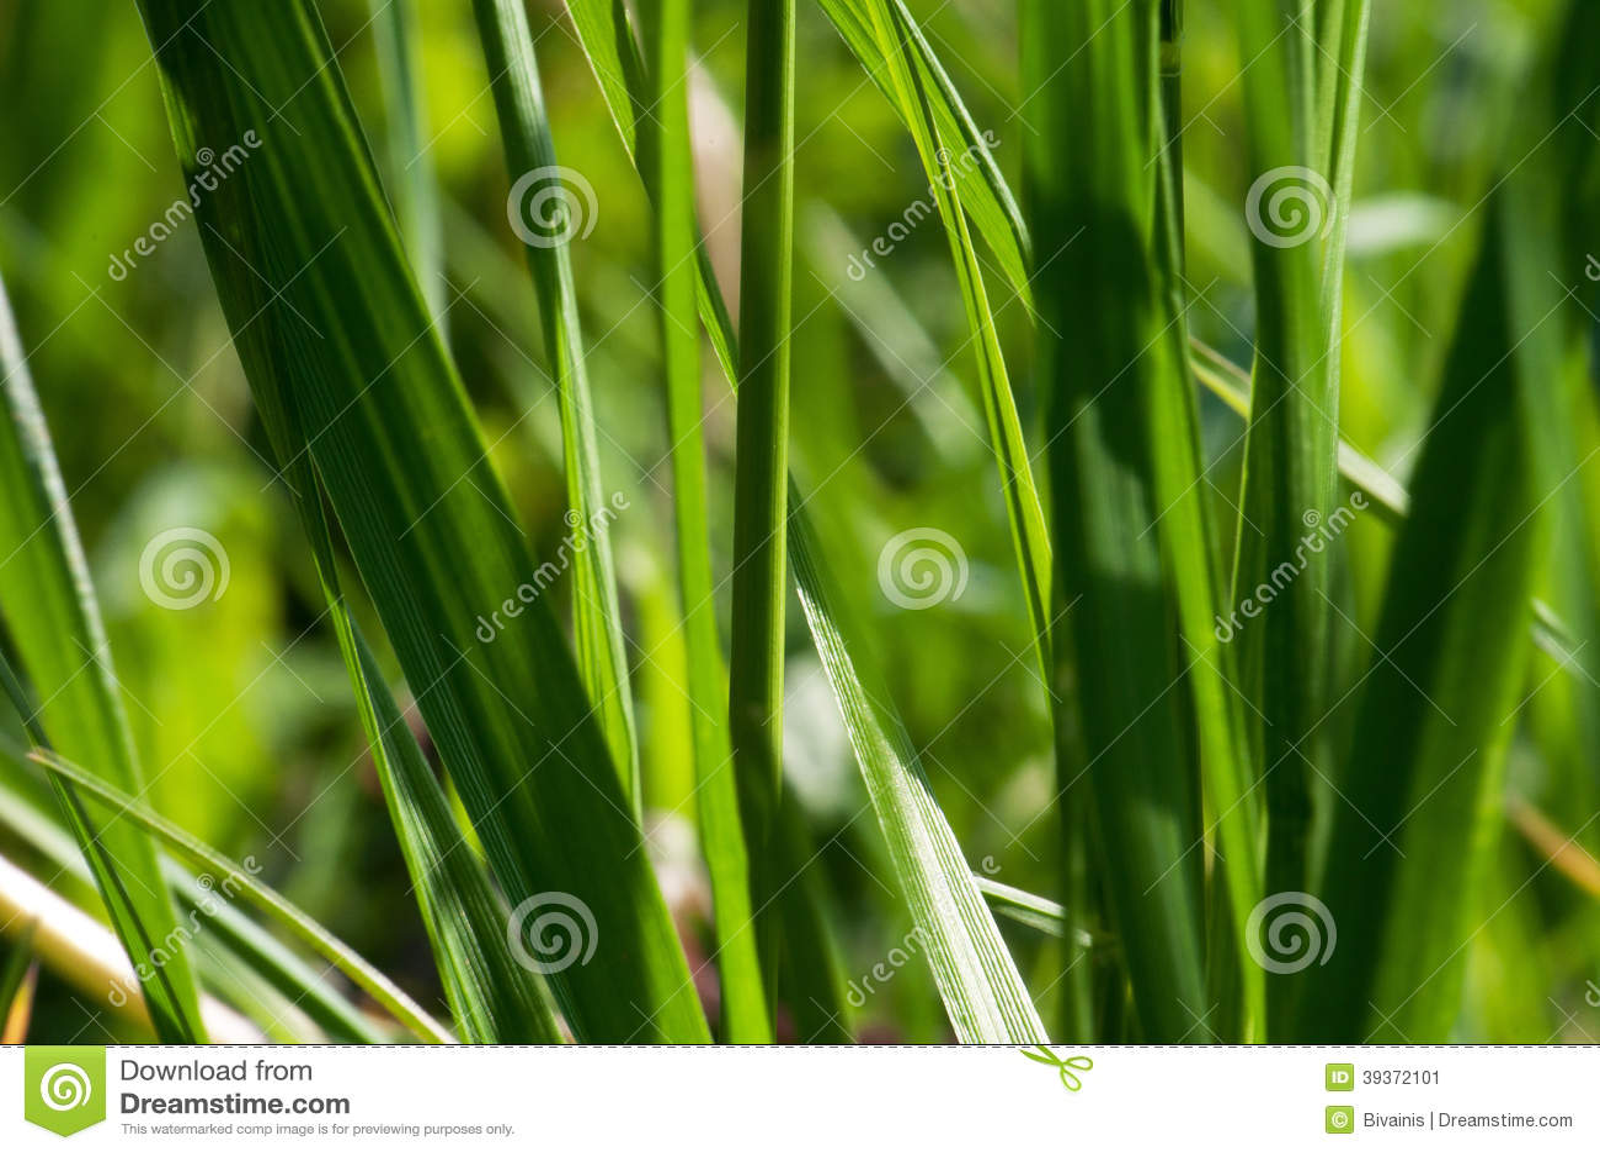 grass macro photography - photo #37